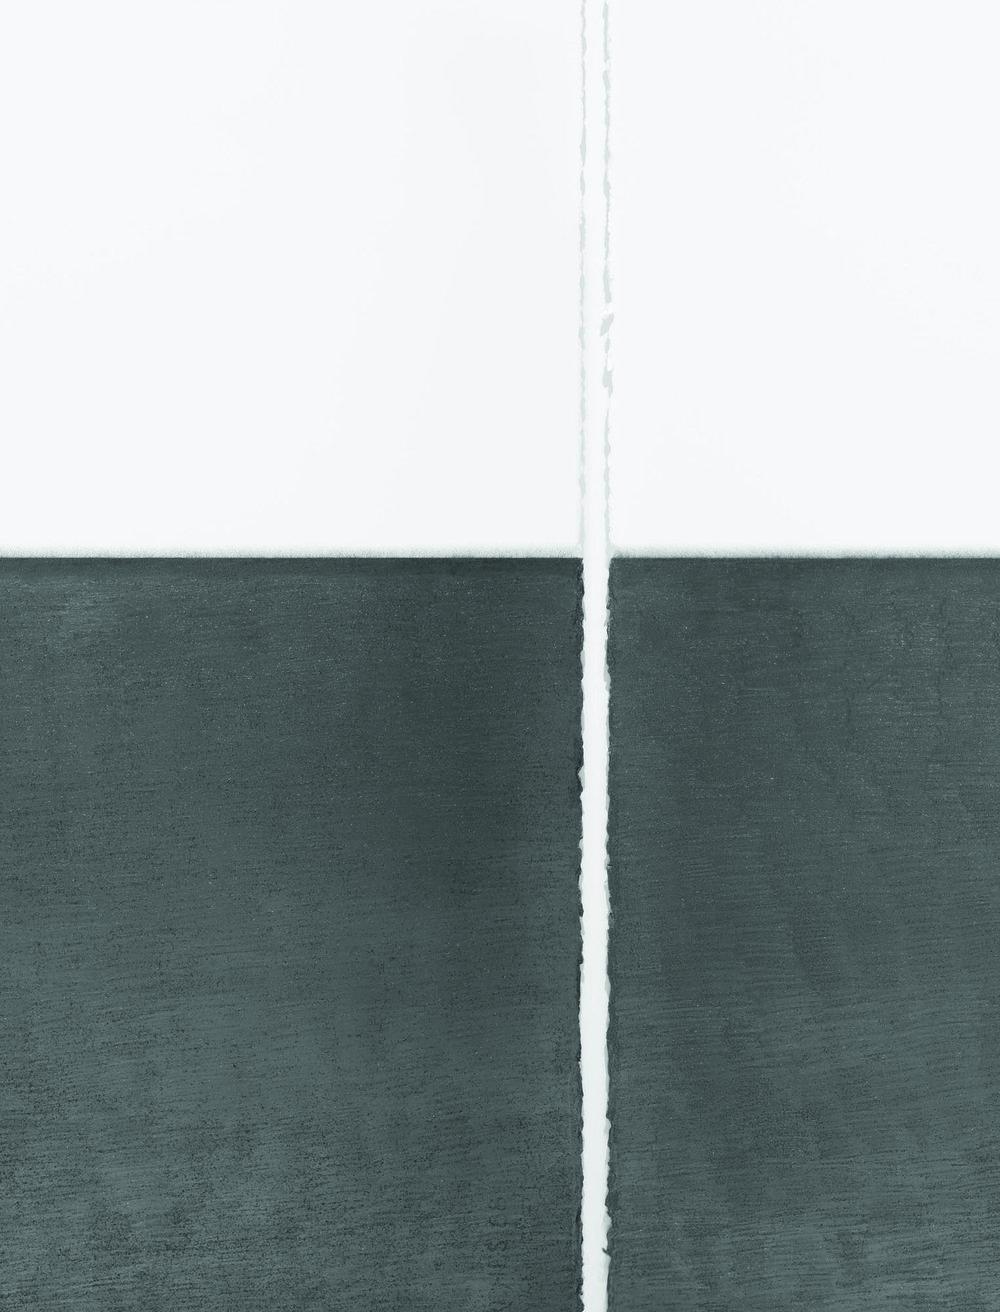 "Unfolding Center no.9  (detail view), 2011-2013  30"" x 22"", graphite pencil on paper"